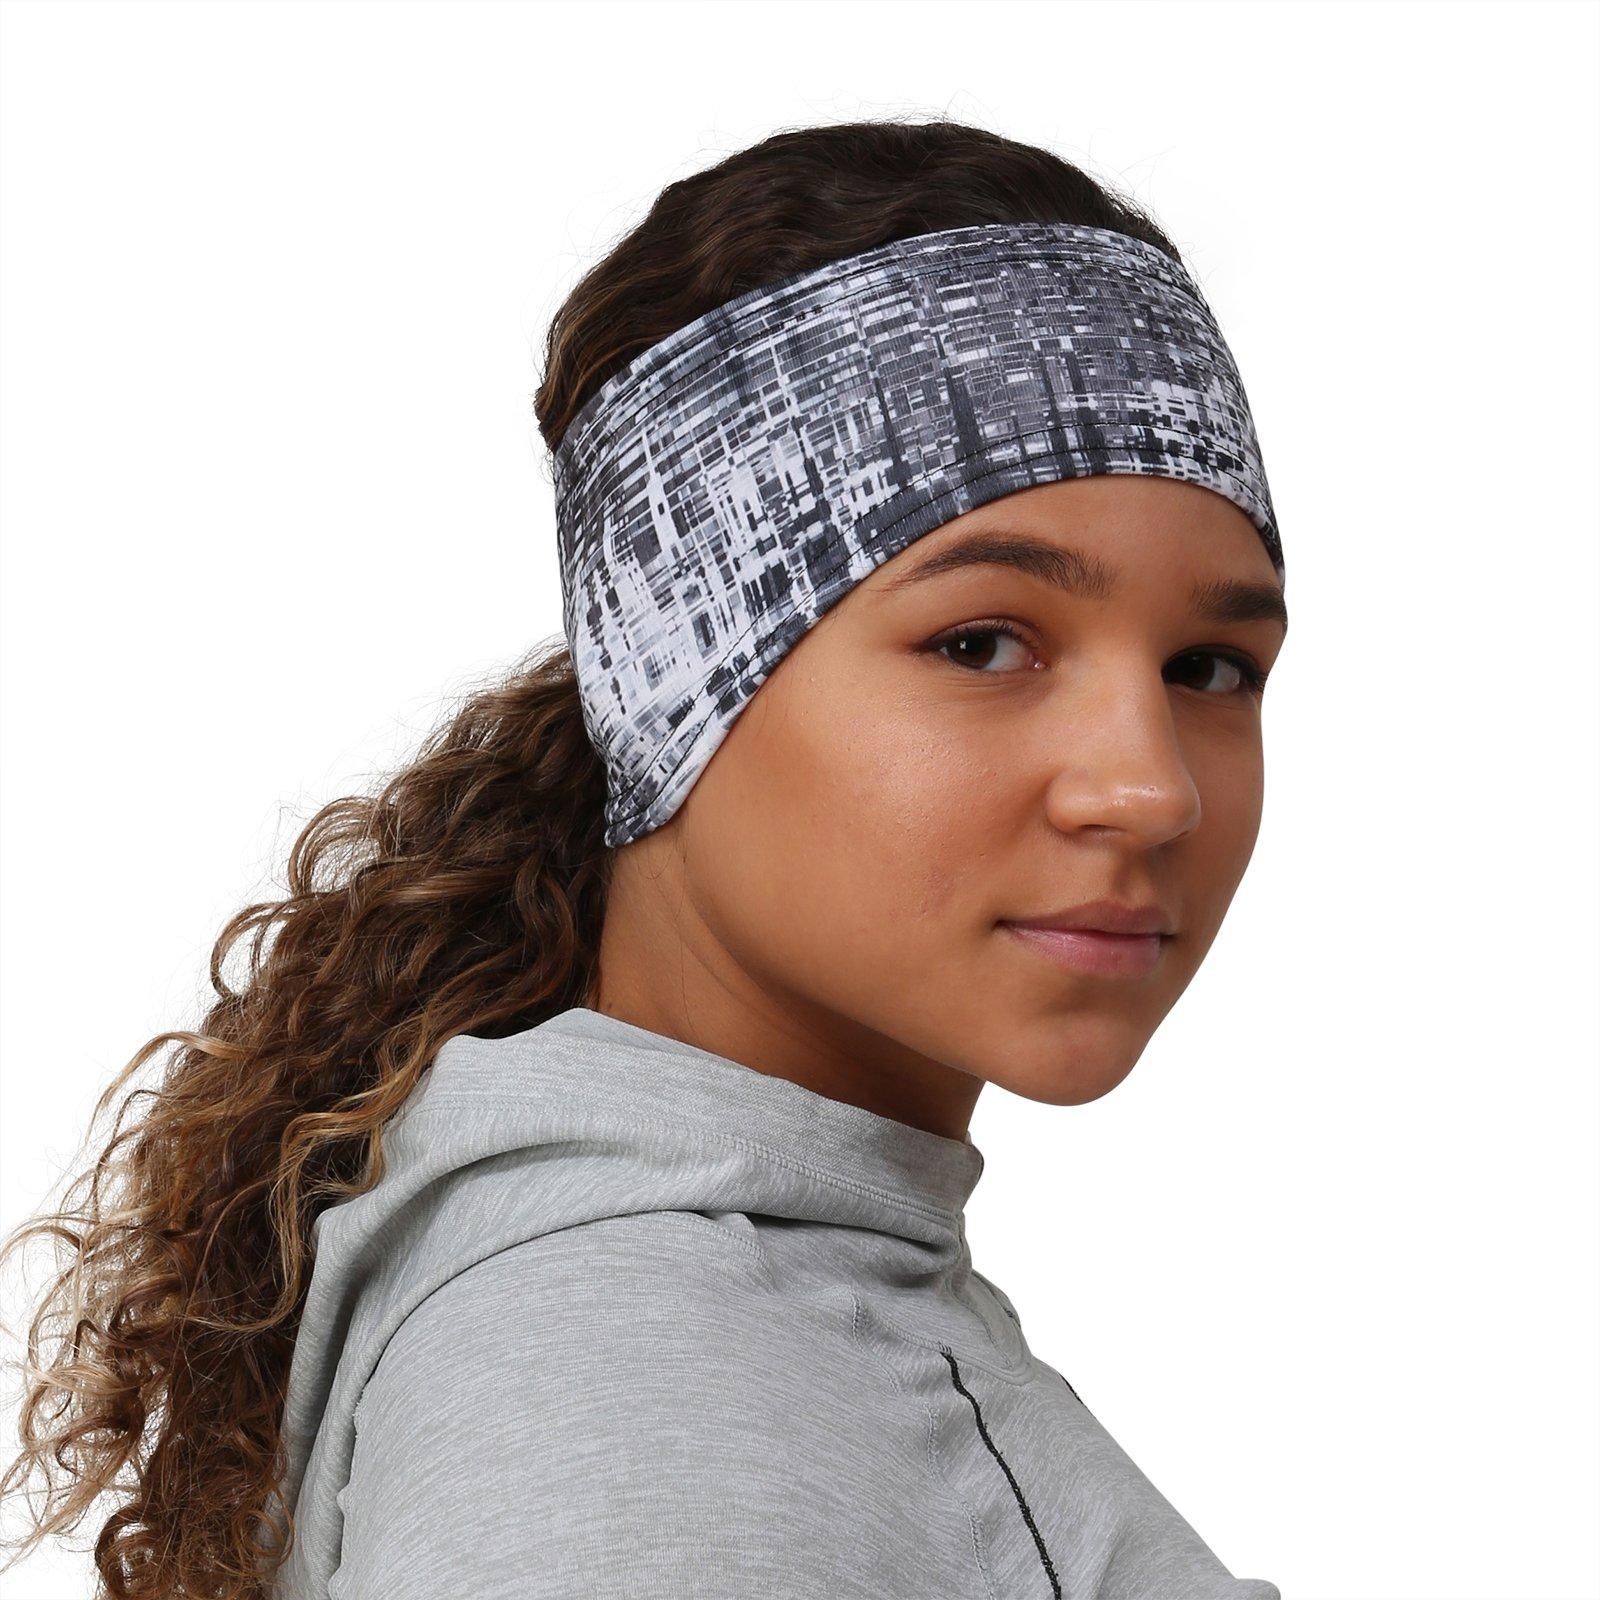 TrailHeads Print Headband | Ear Warmer and Ponytail Headband for Women – 12 Prints - Made in USA - Grey Matrix